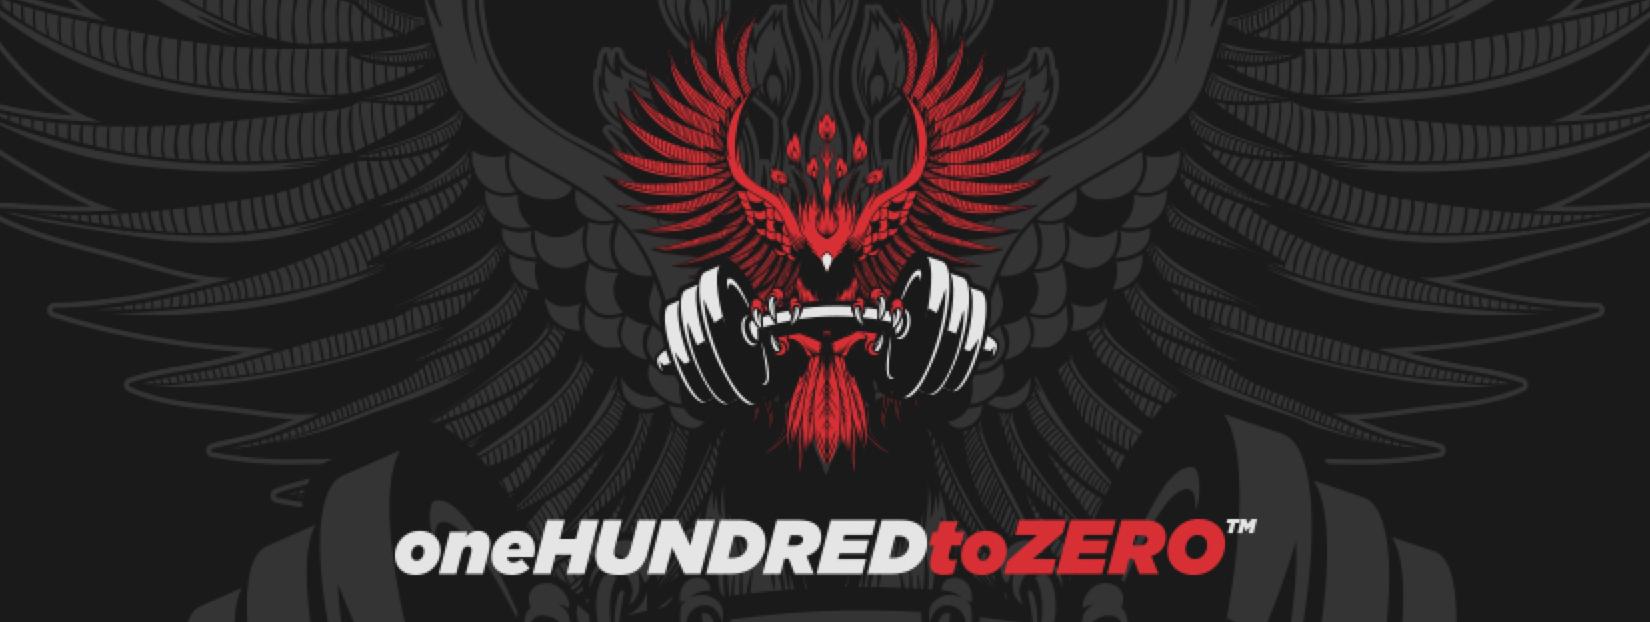 One Hundred to Zero